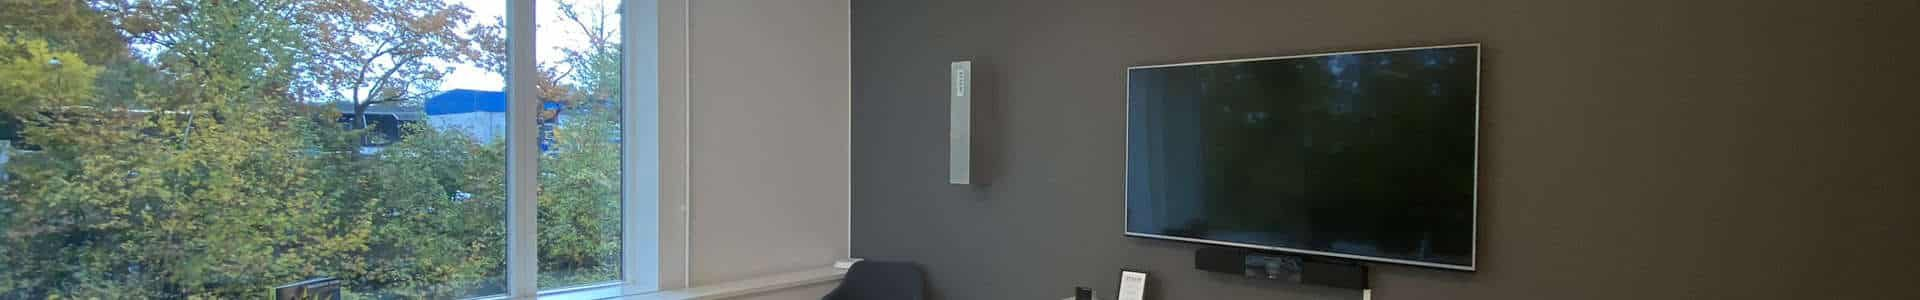 Topbanner UV AIR